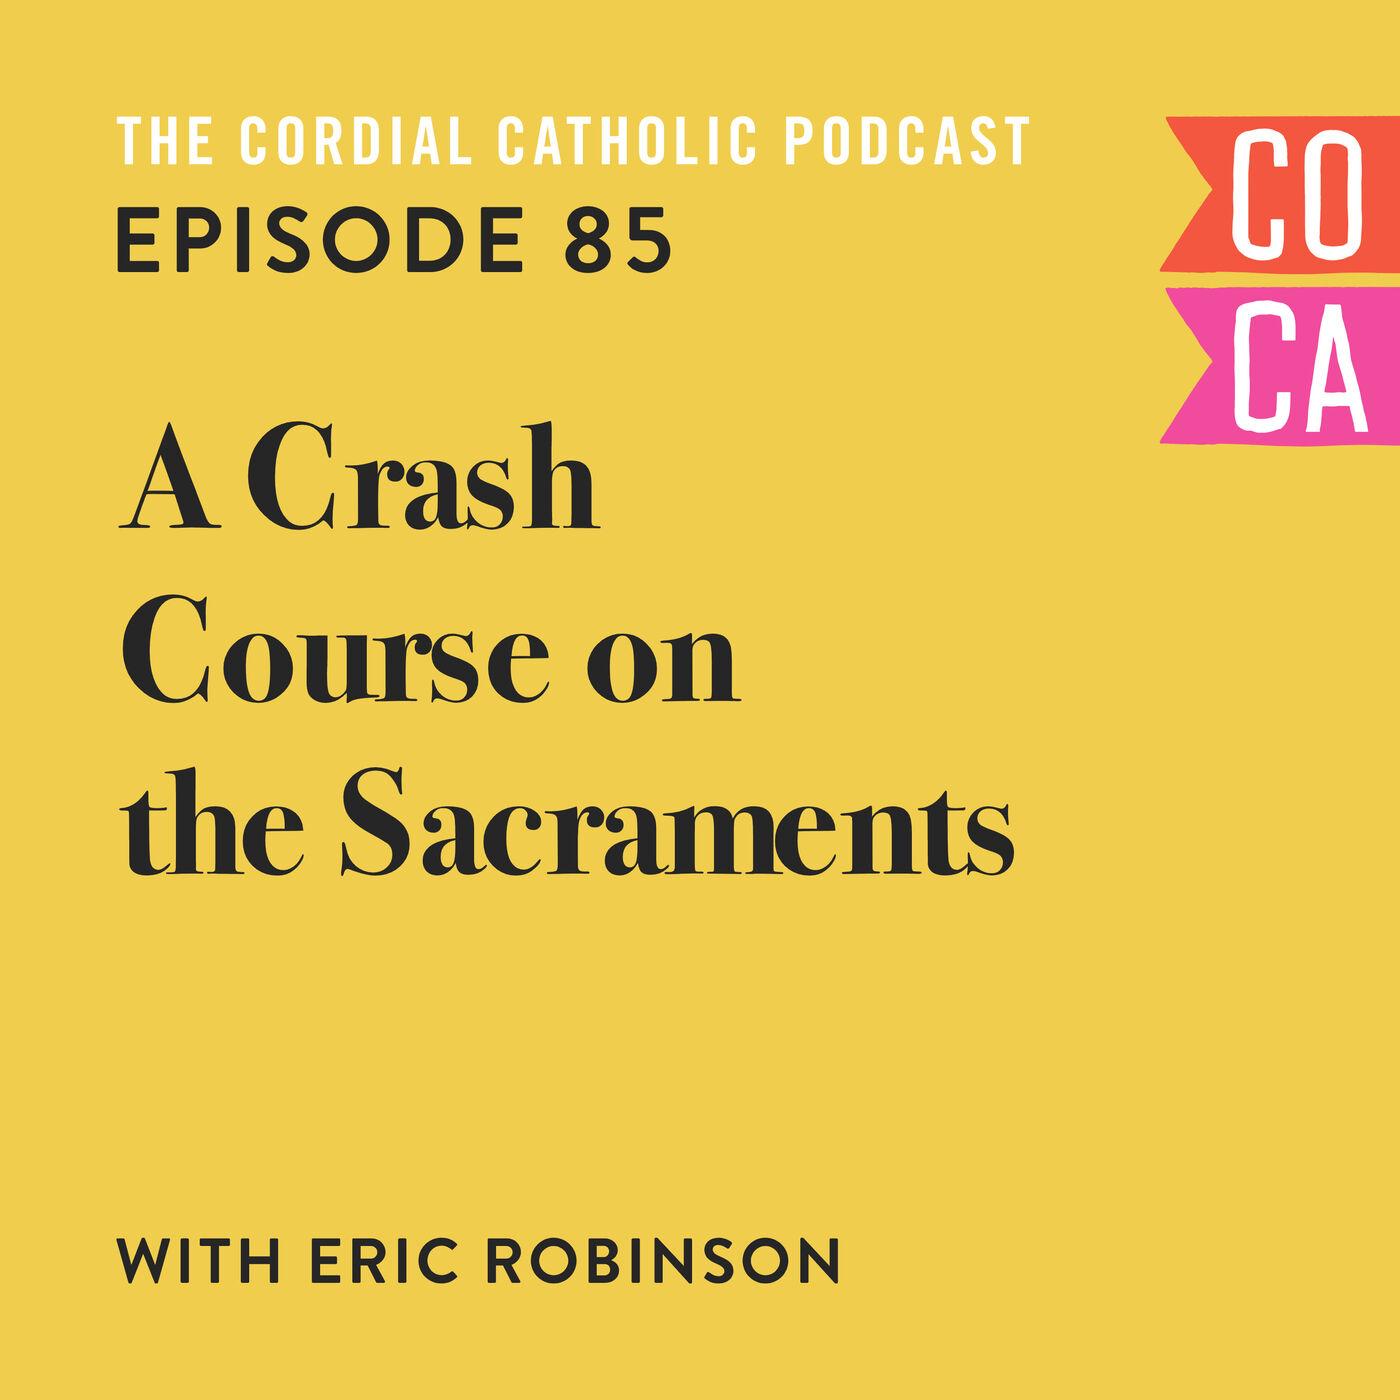 085: A Crash Course on the Sacraments (w/ Eric Robinson)